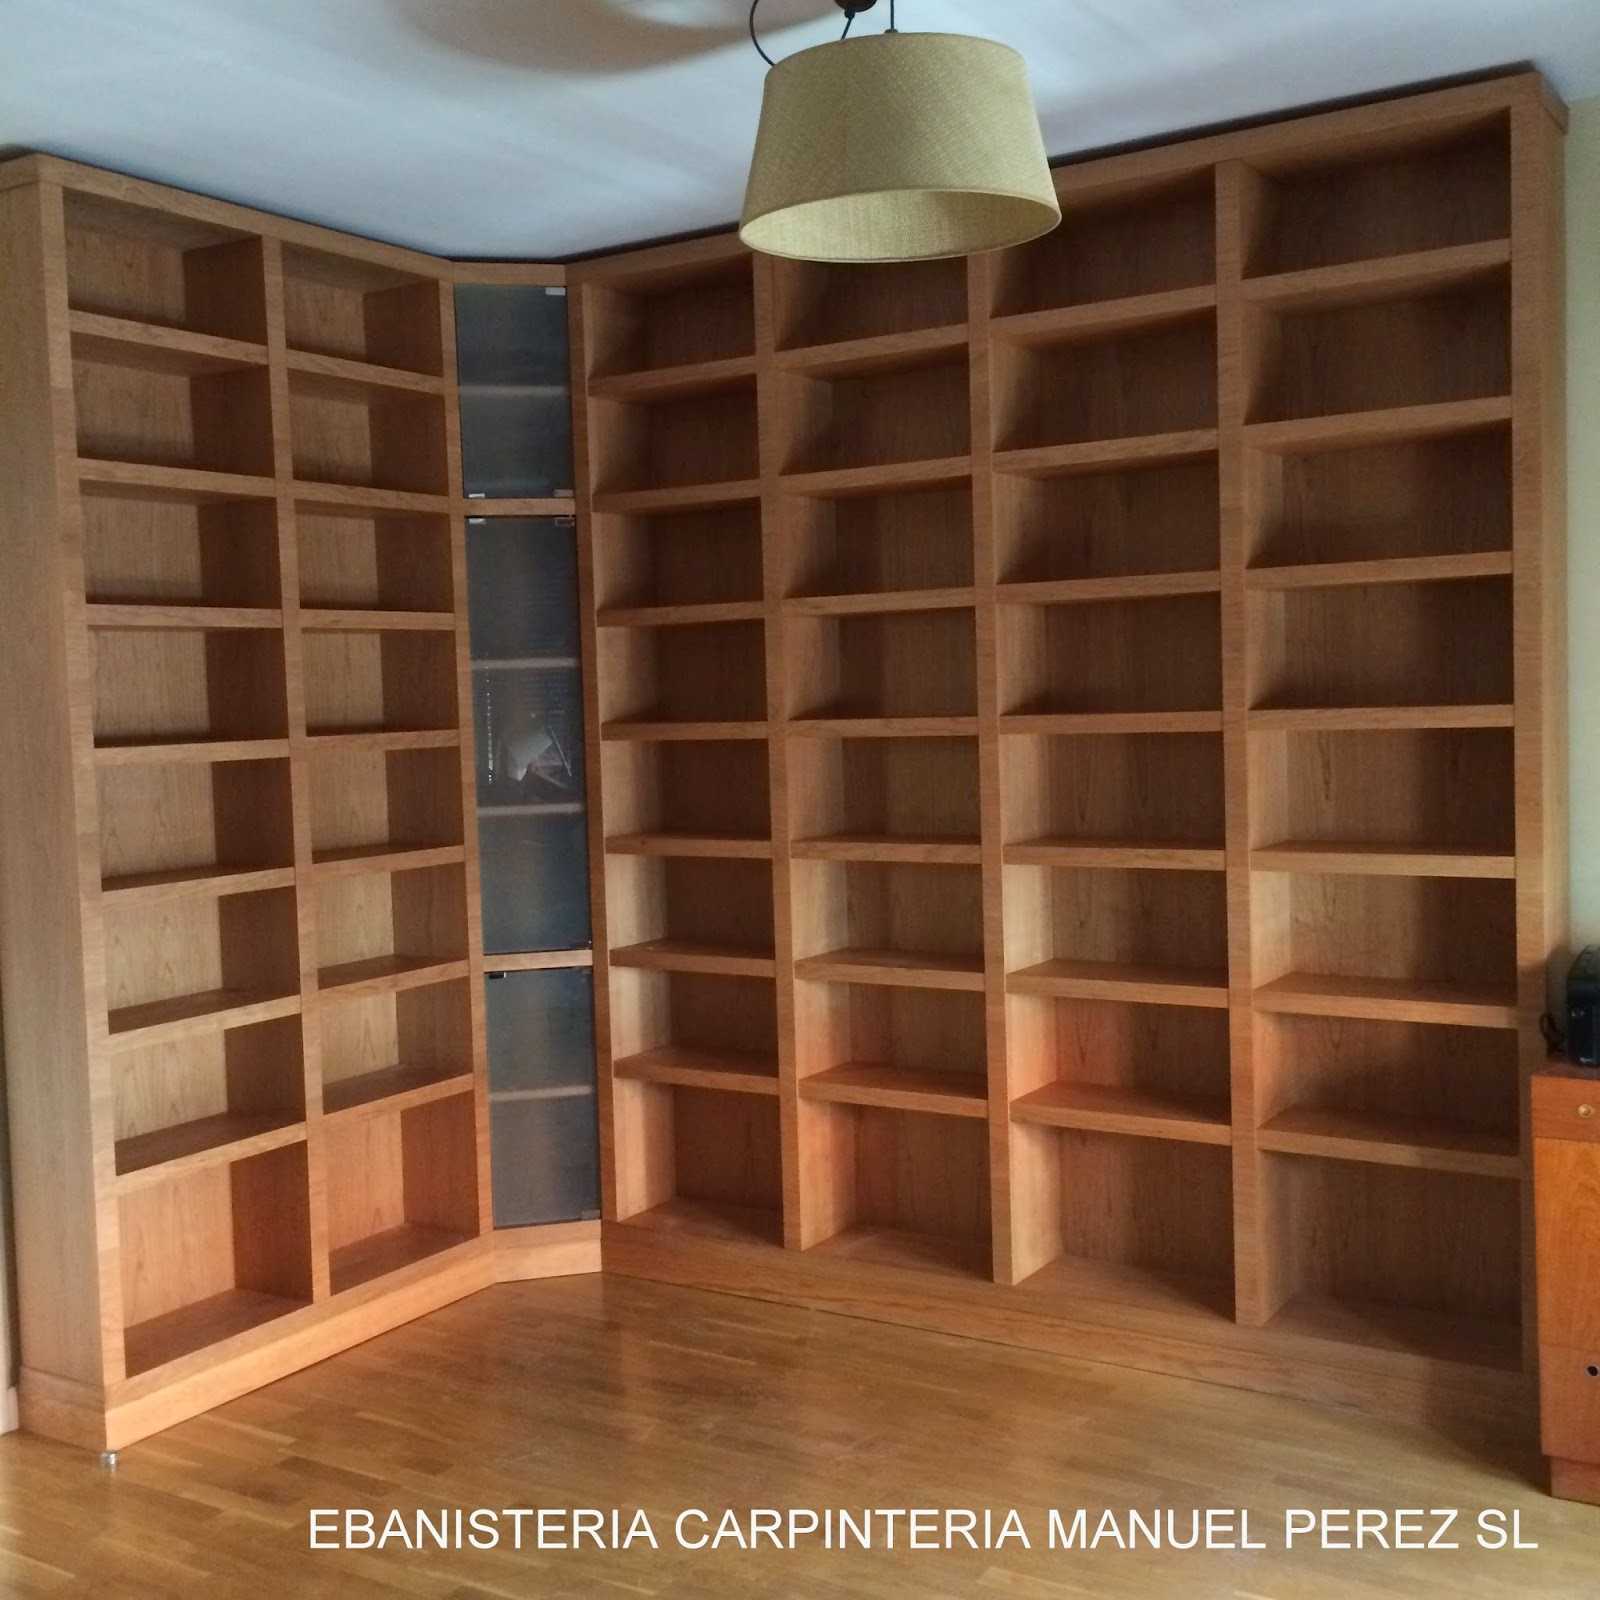 Ebanisteria carpinteria manuel perez zaragoza - Madera a medida ...